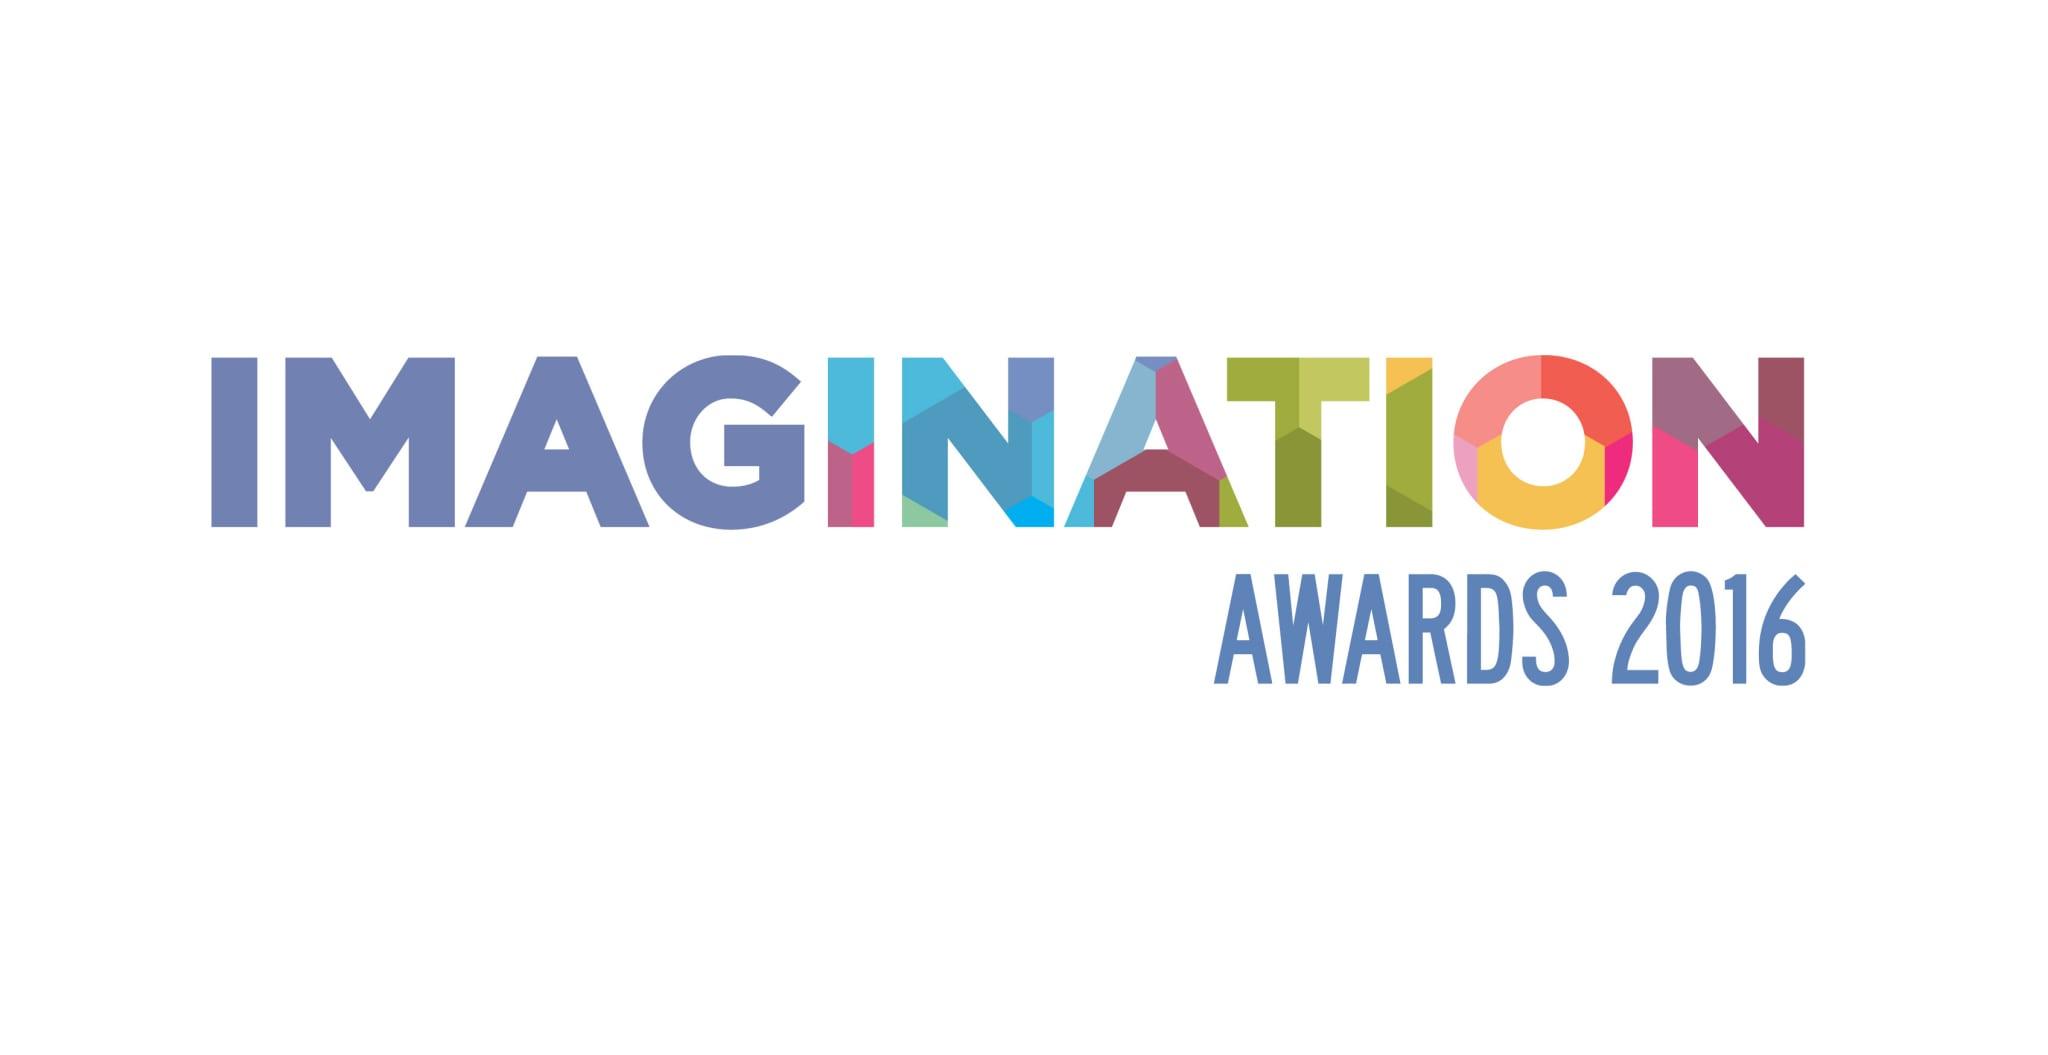 IMAGination-Logo-2016